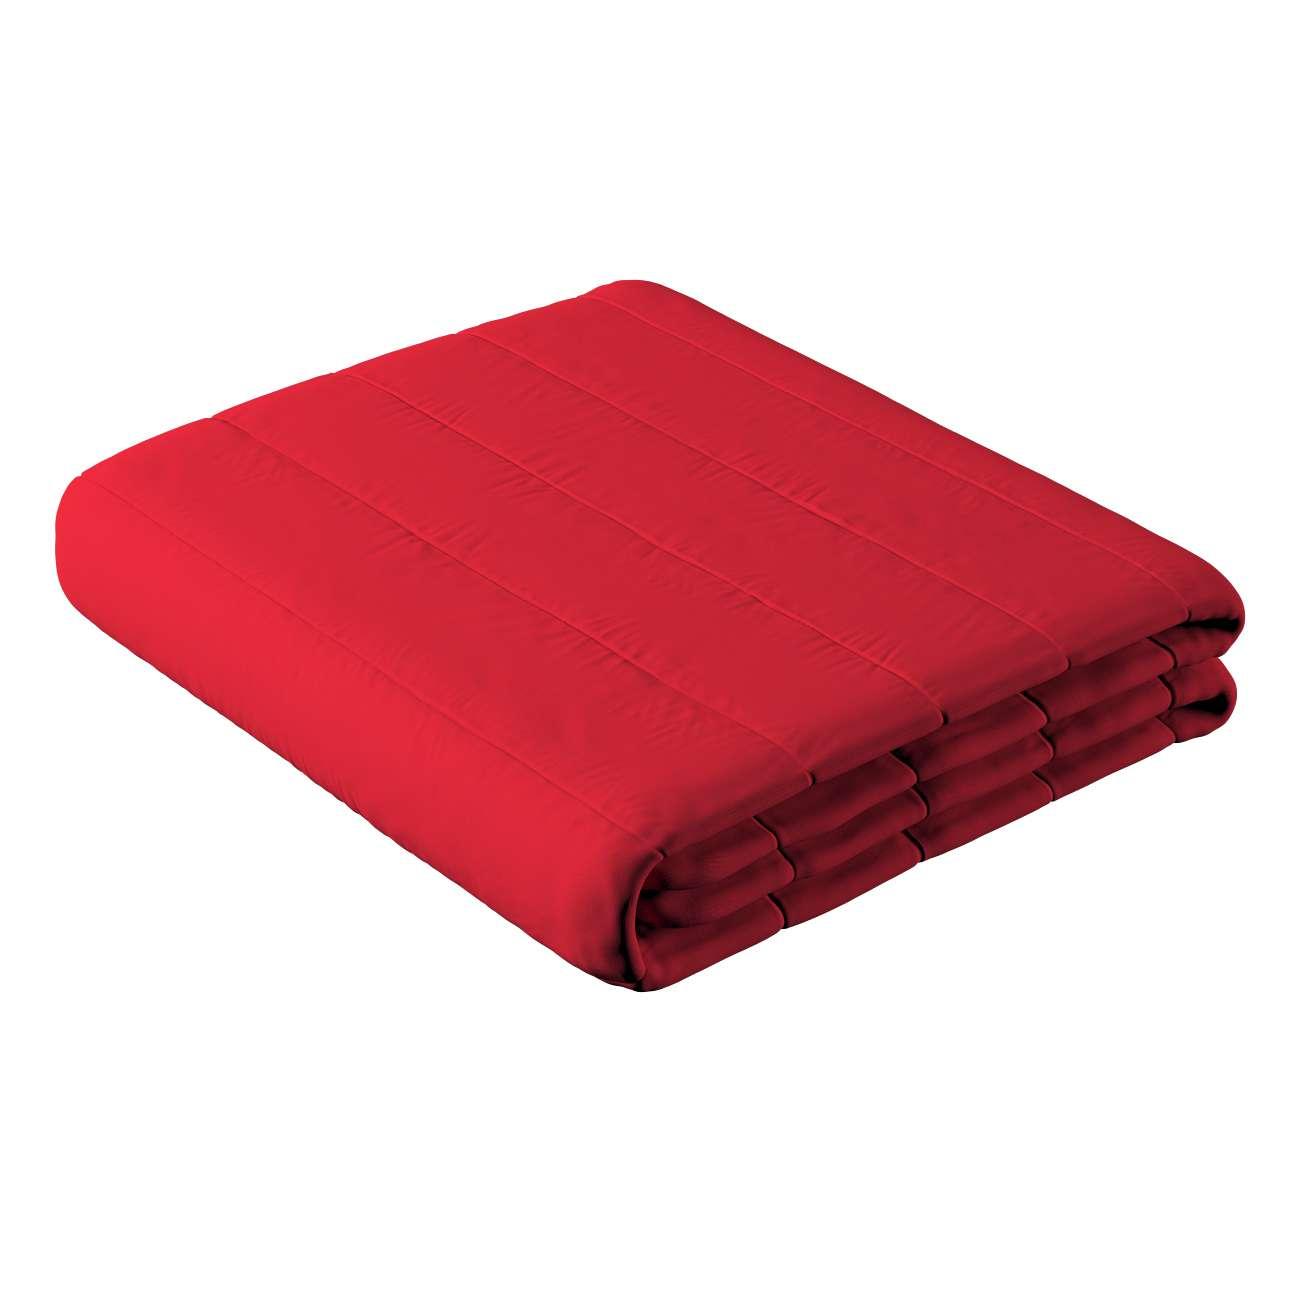 narzuta pikowana w pasy scarlet red czerwony dekoria. Black Bedroom Furniture Sets. Home Design Ideas